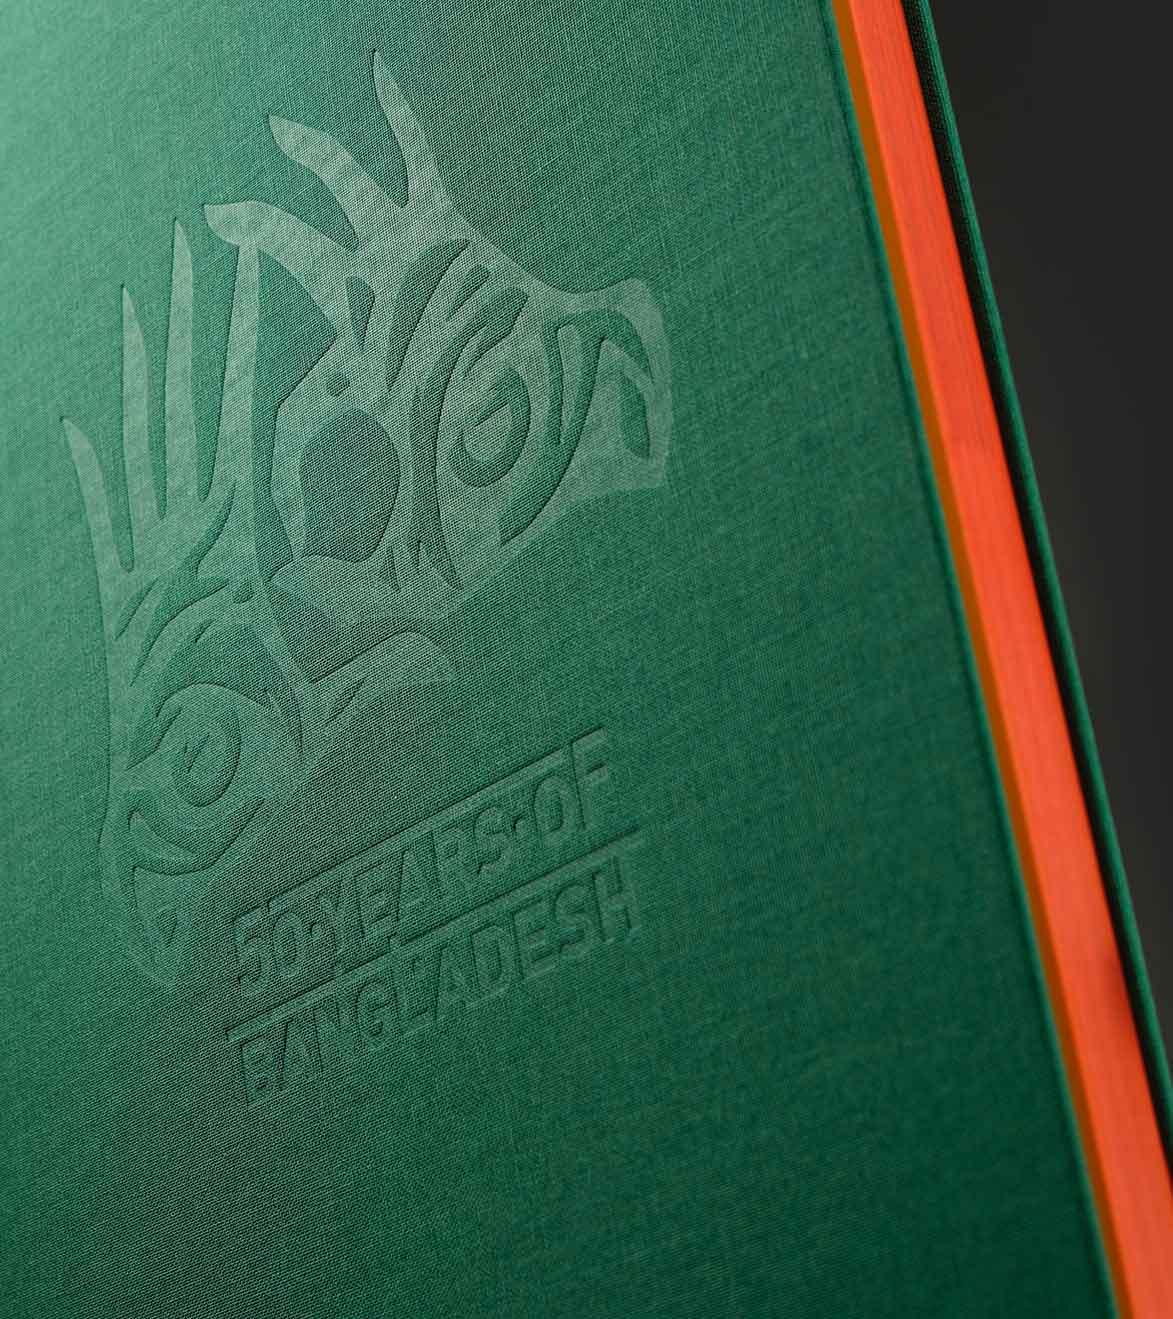 trommer 50 years of bangladesh book logo embossing